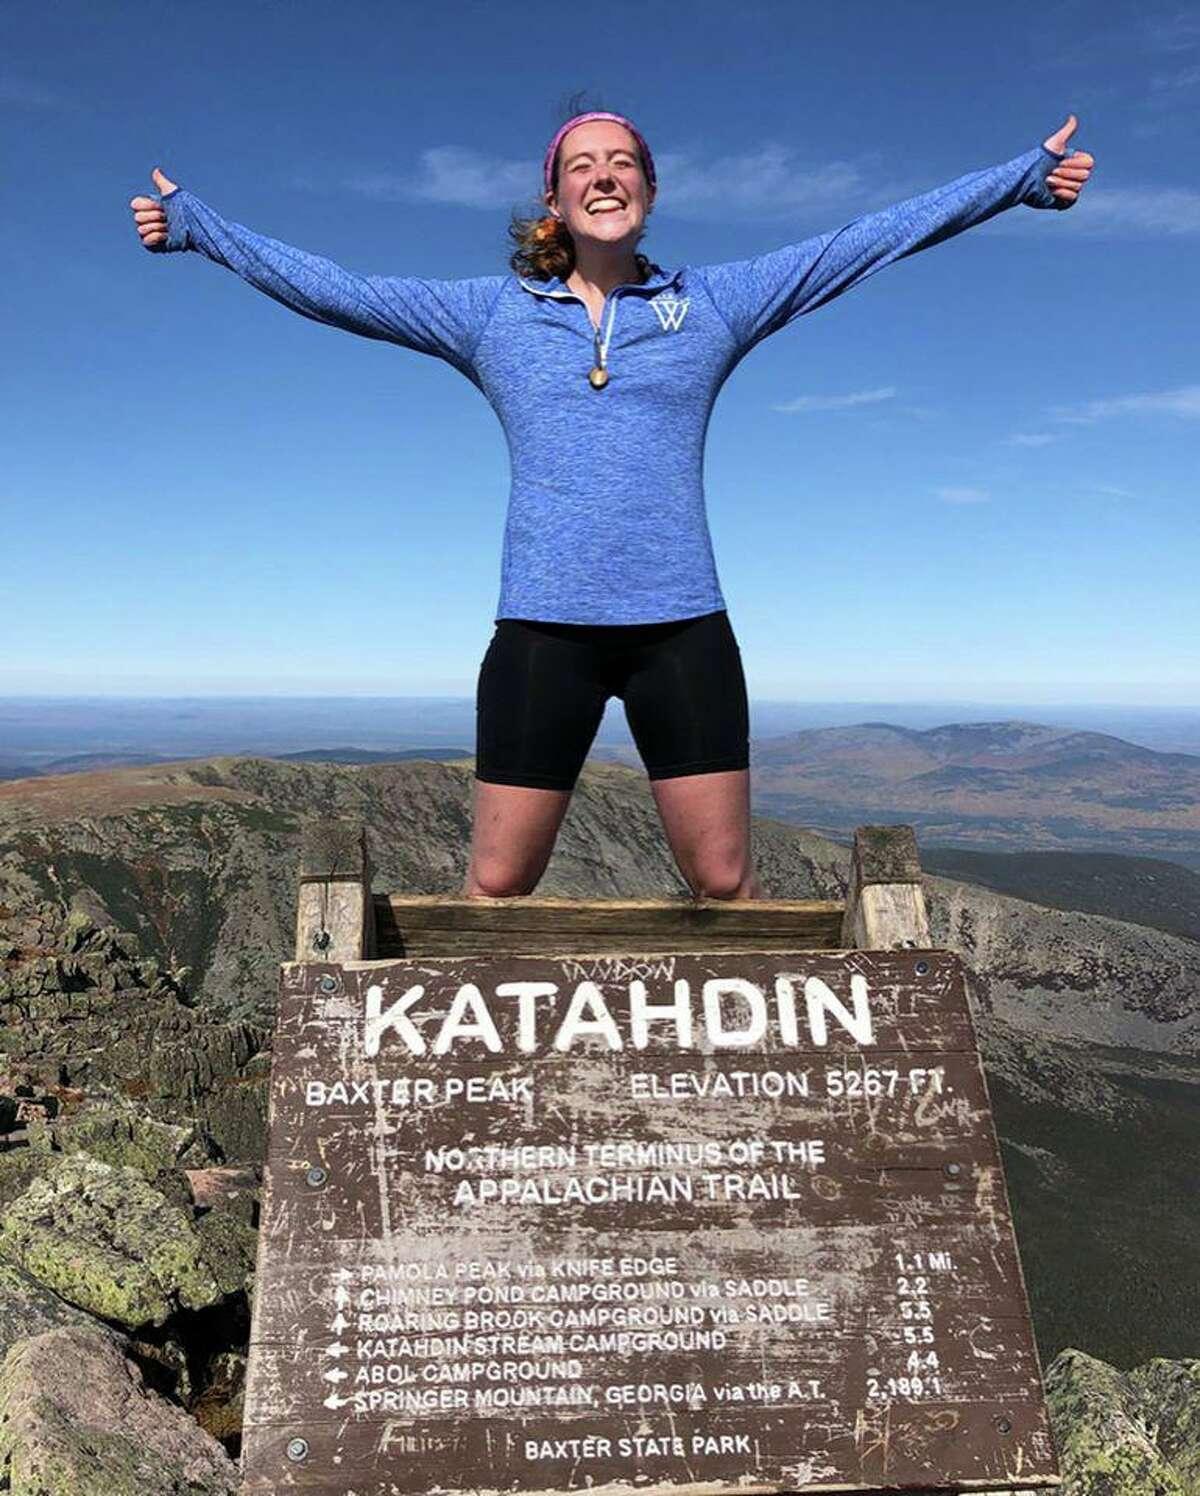 Diana Jackson, 23, of Darien, finishes her Appalachian Trail adventure on the peak of Mt Katahdin.